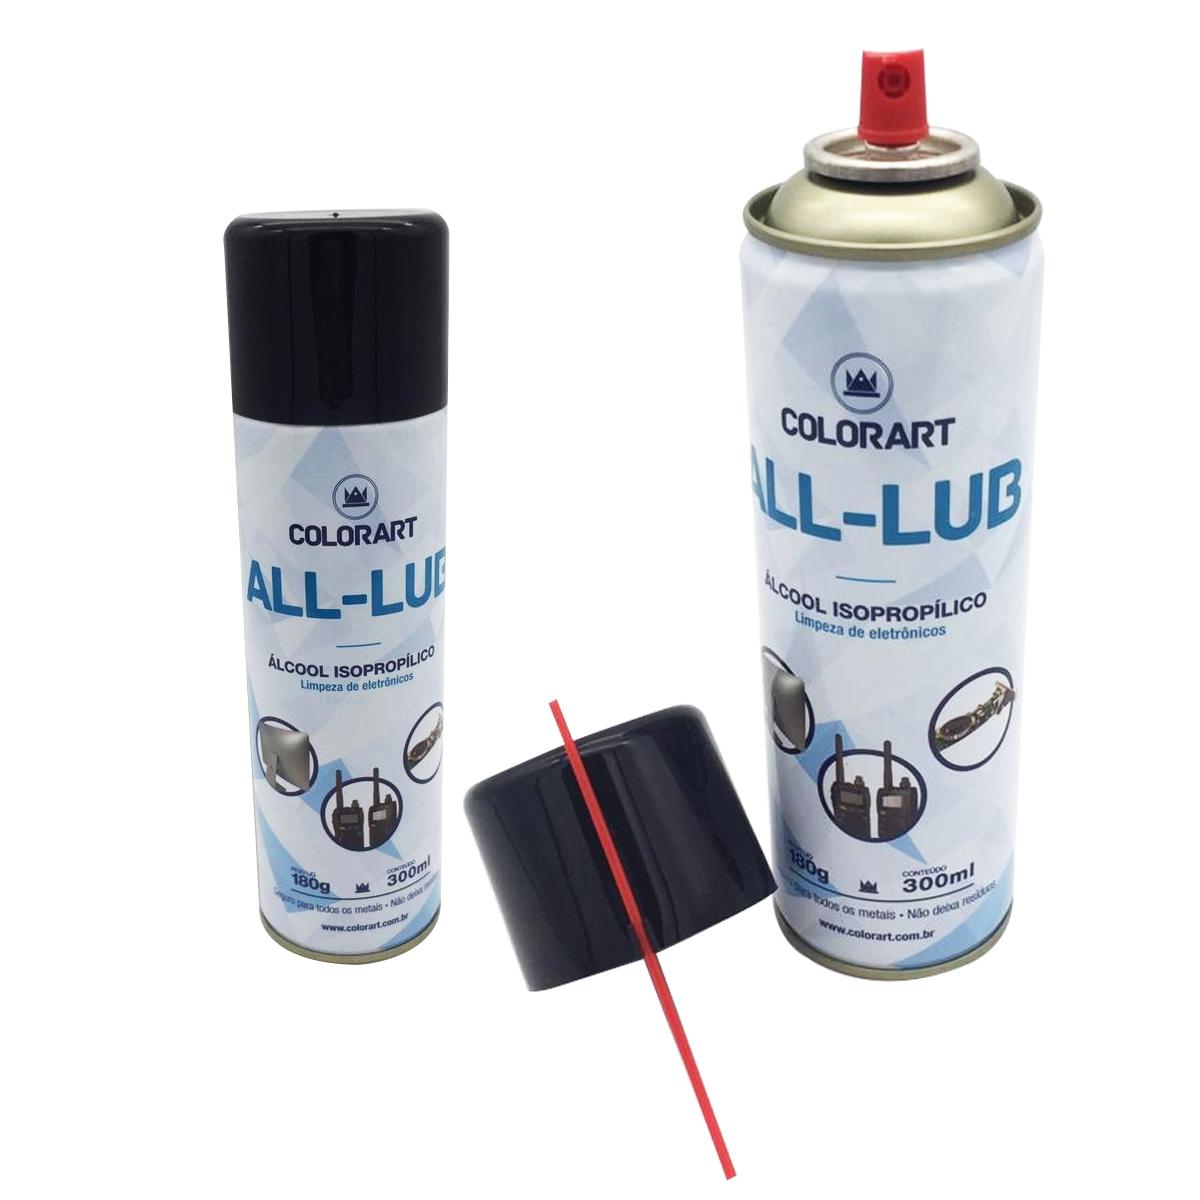 2 Spray Álcool Isopropílico Limeza Eletronicos Celular 300ml